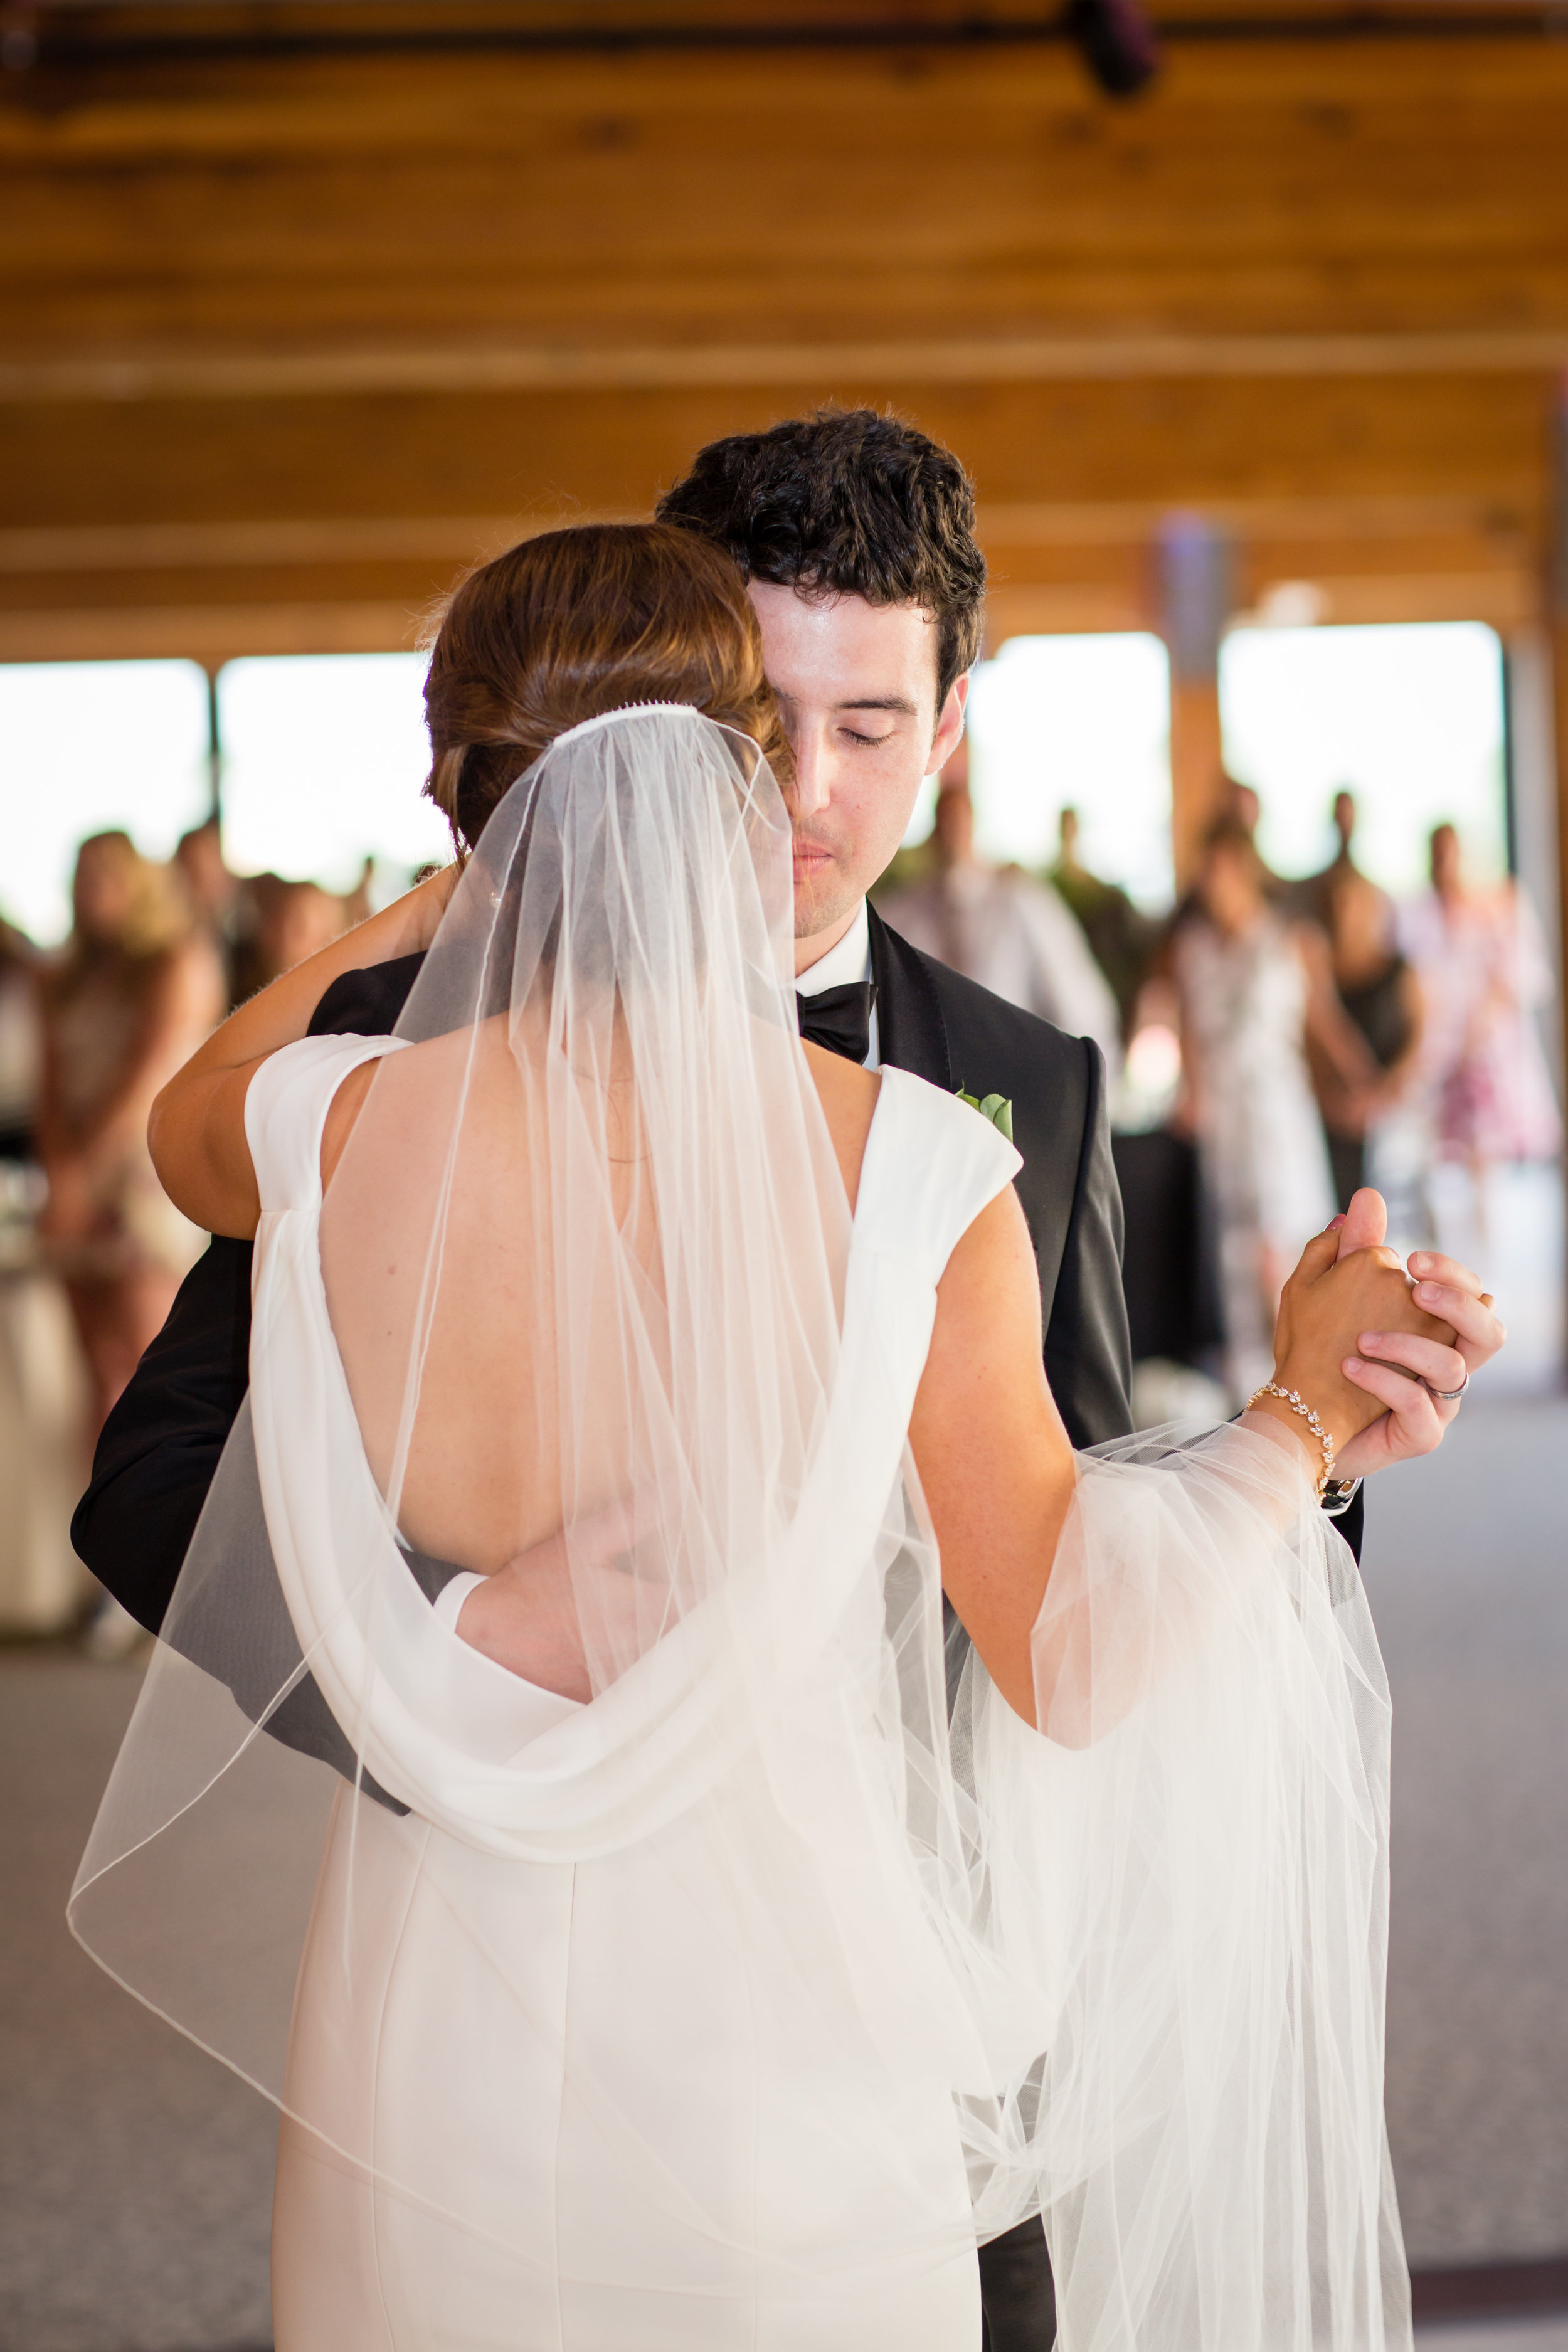 Aversa Wedding 6.10.17-375.JPG